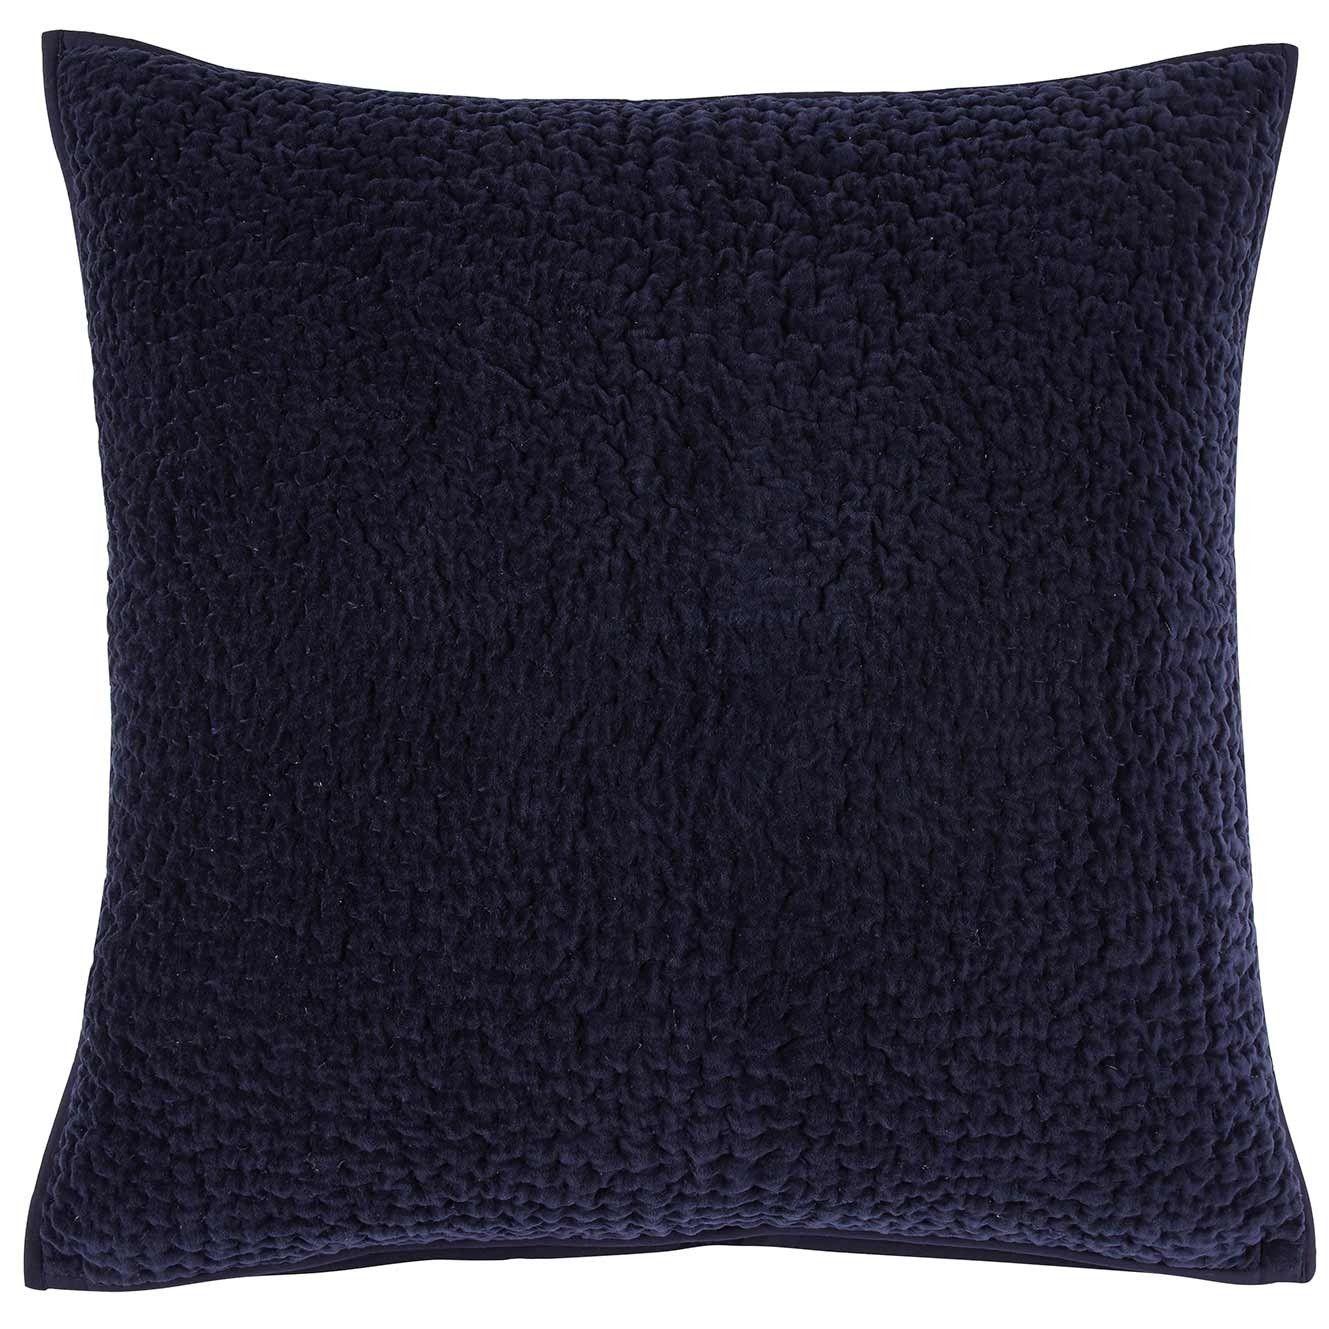 Bahari Indigo Euro (With images) Cotton velvet, John